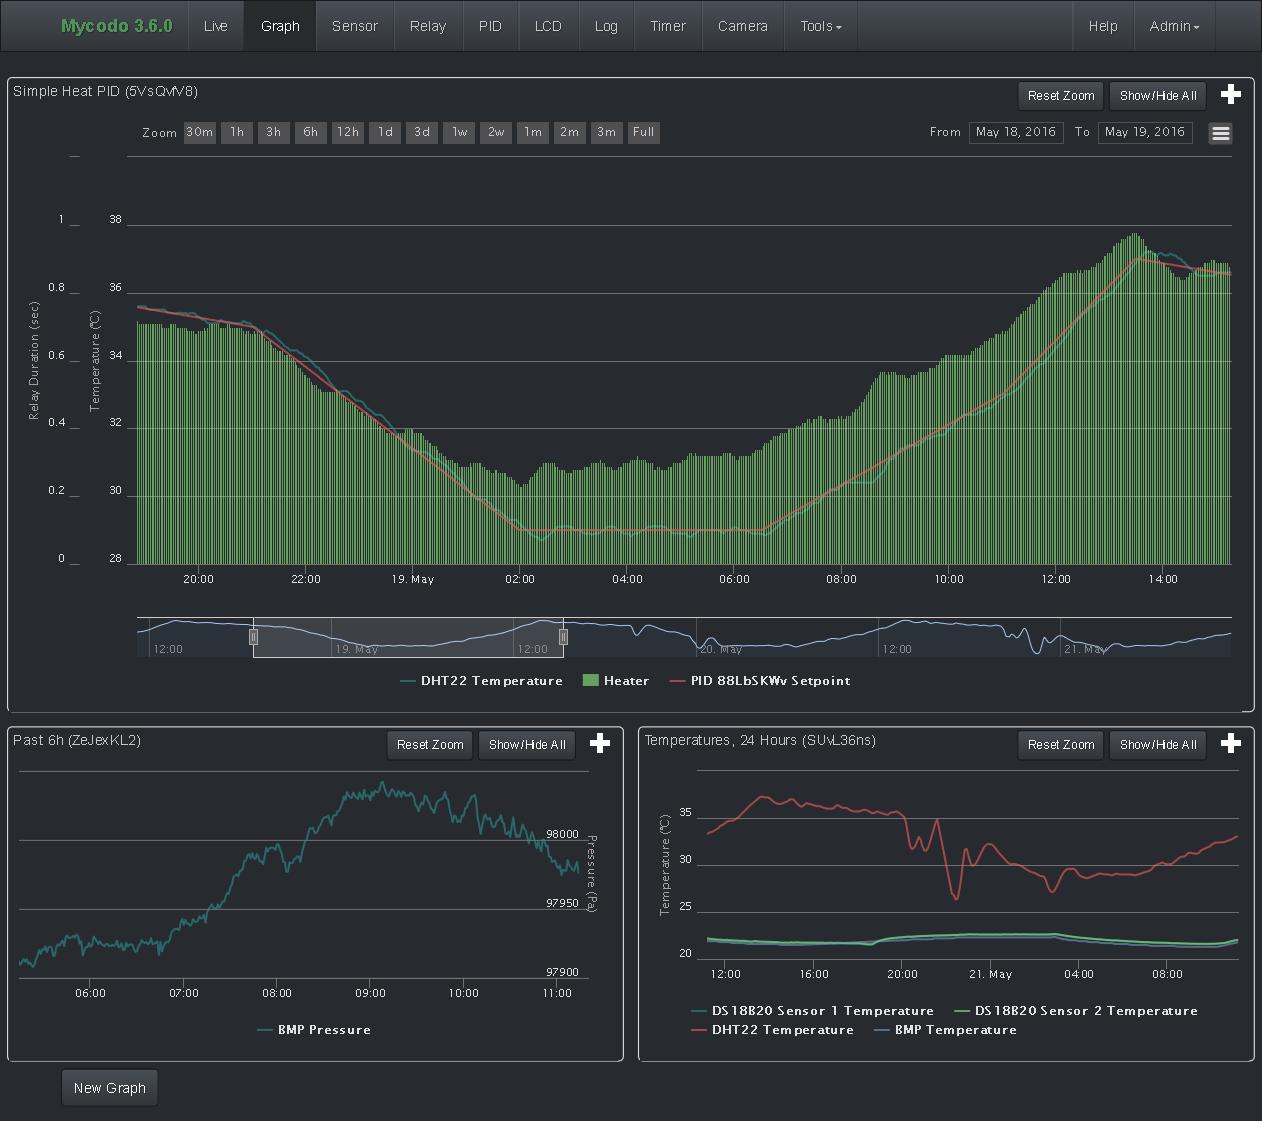 GitHub - kizniche/Mycodo: An environmental monitoring and regulation